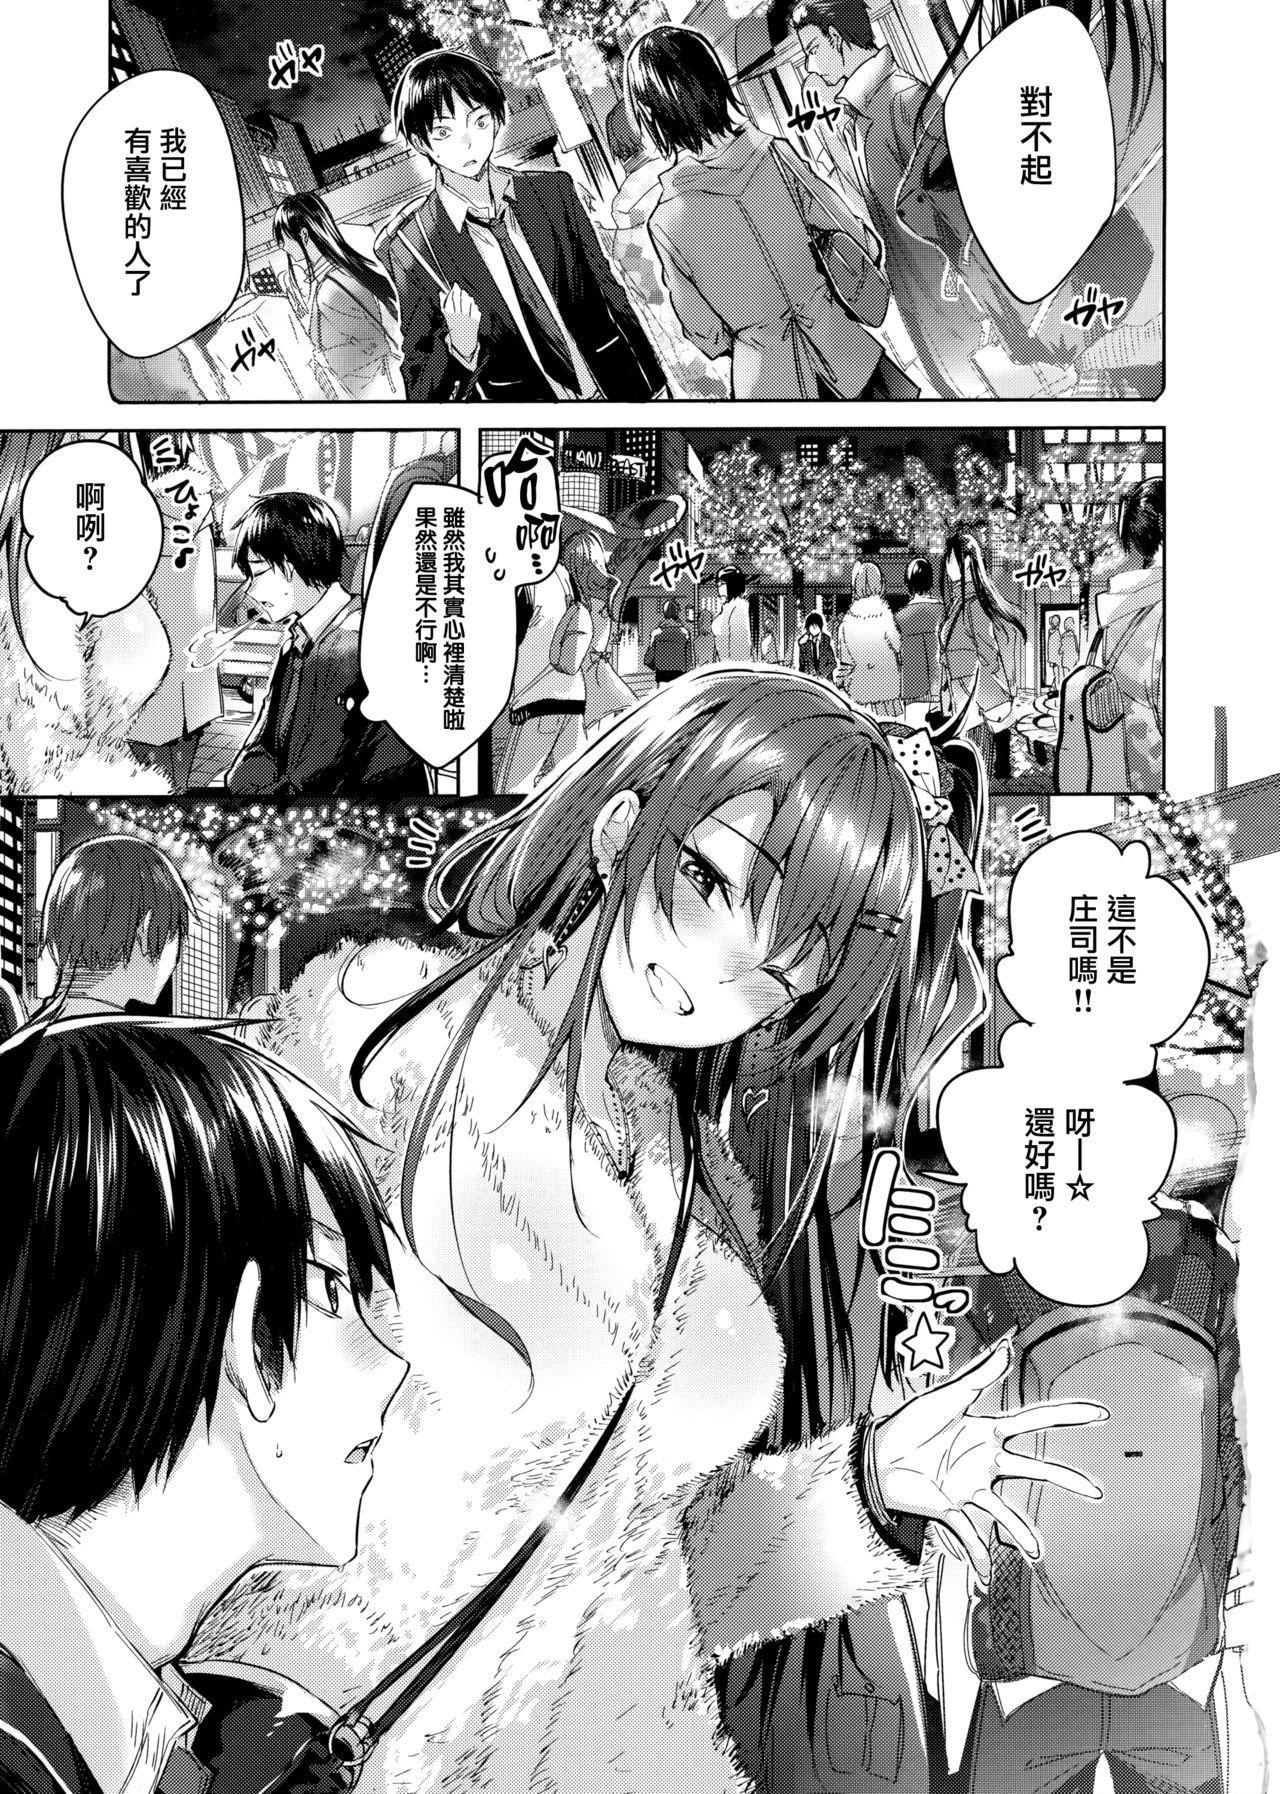 [Kakao] Nakadashi Strike! - Winning strike! Ch. 1-2  [Chinese] [兔司姬漢化組] 10